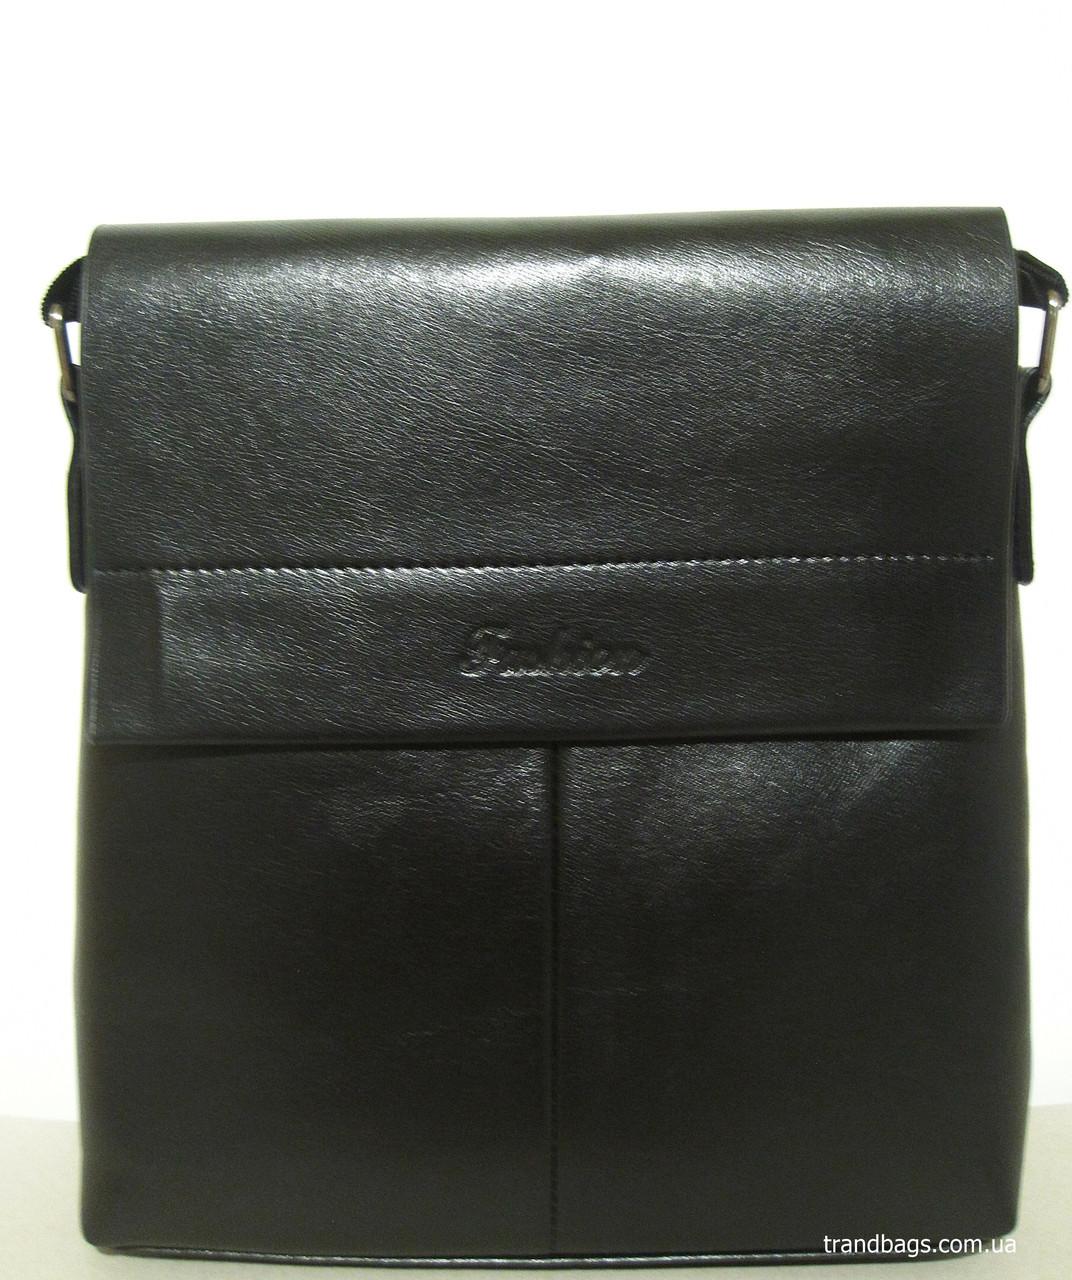 9daedfe78cf6 Мужская сумка А2027-3 black FASHION мужская сумка на плечо не дорого Одесса  7 км